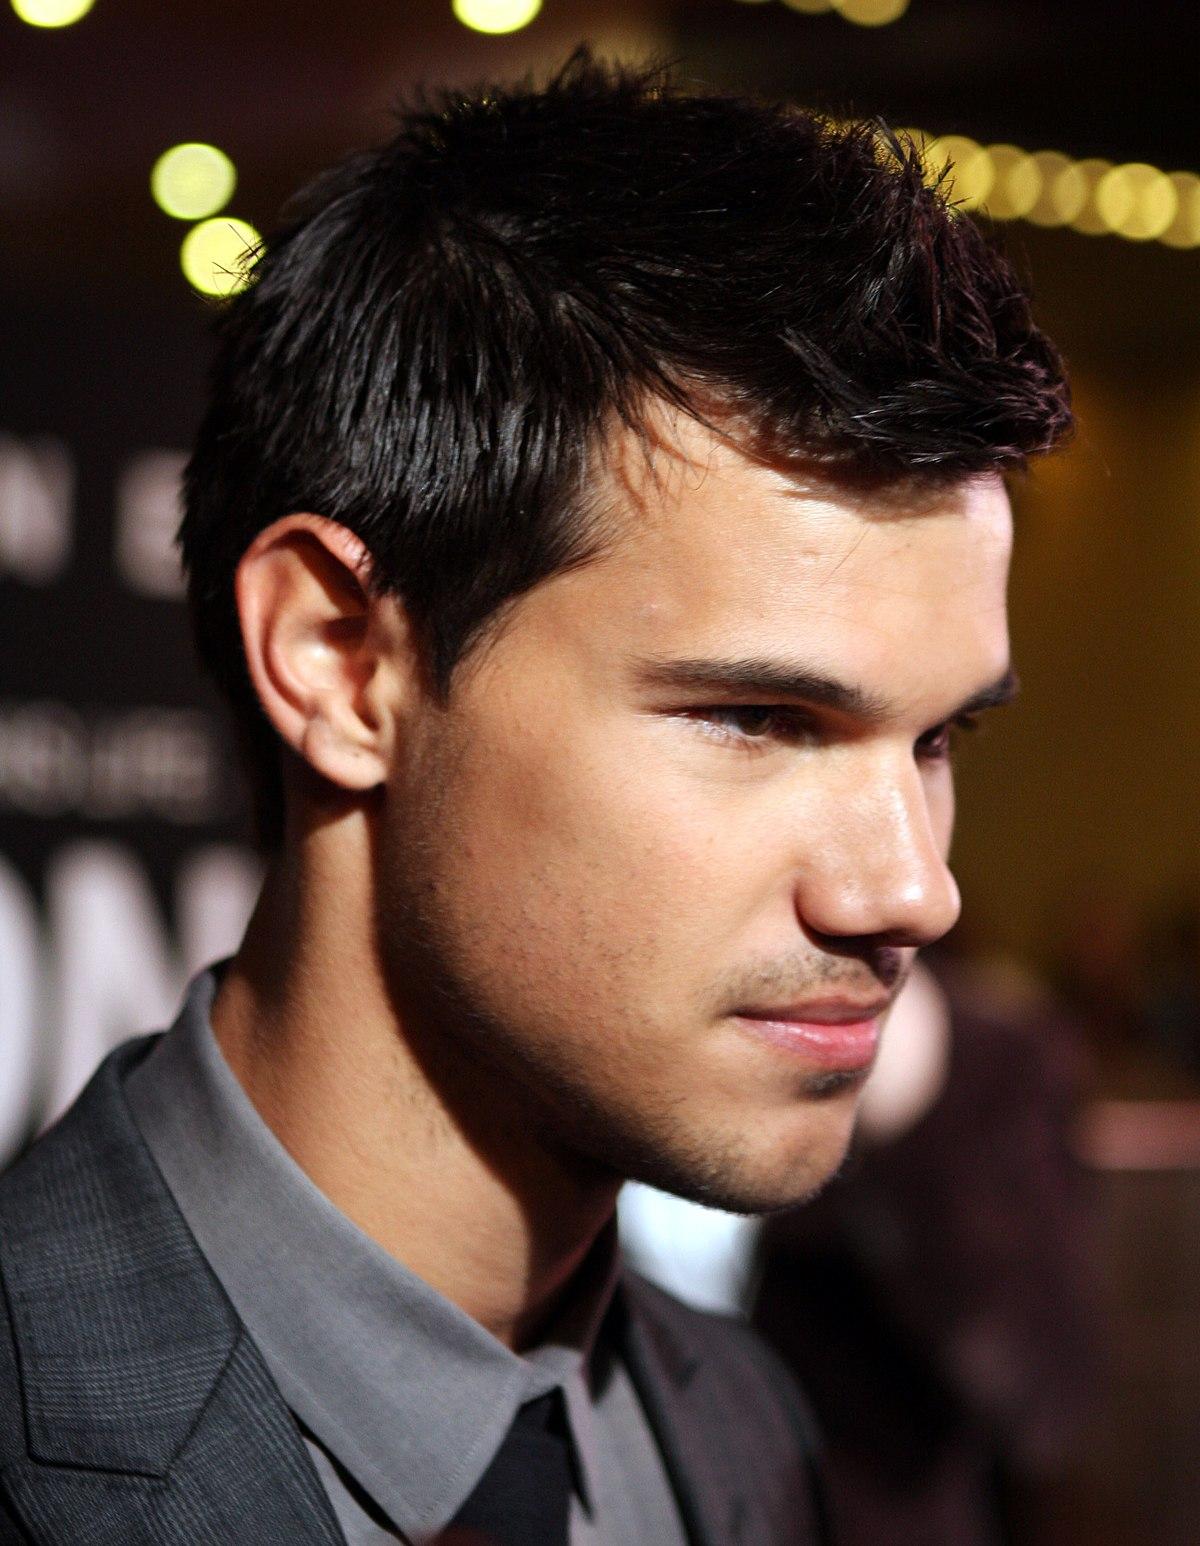 Taylor Lautner - Wikipedija, prosta enciklopedija Taylor Lautner